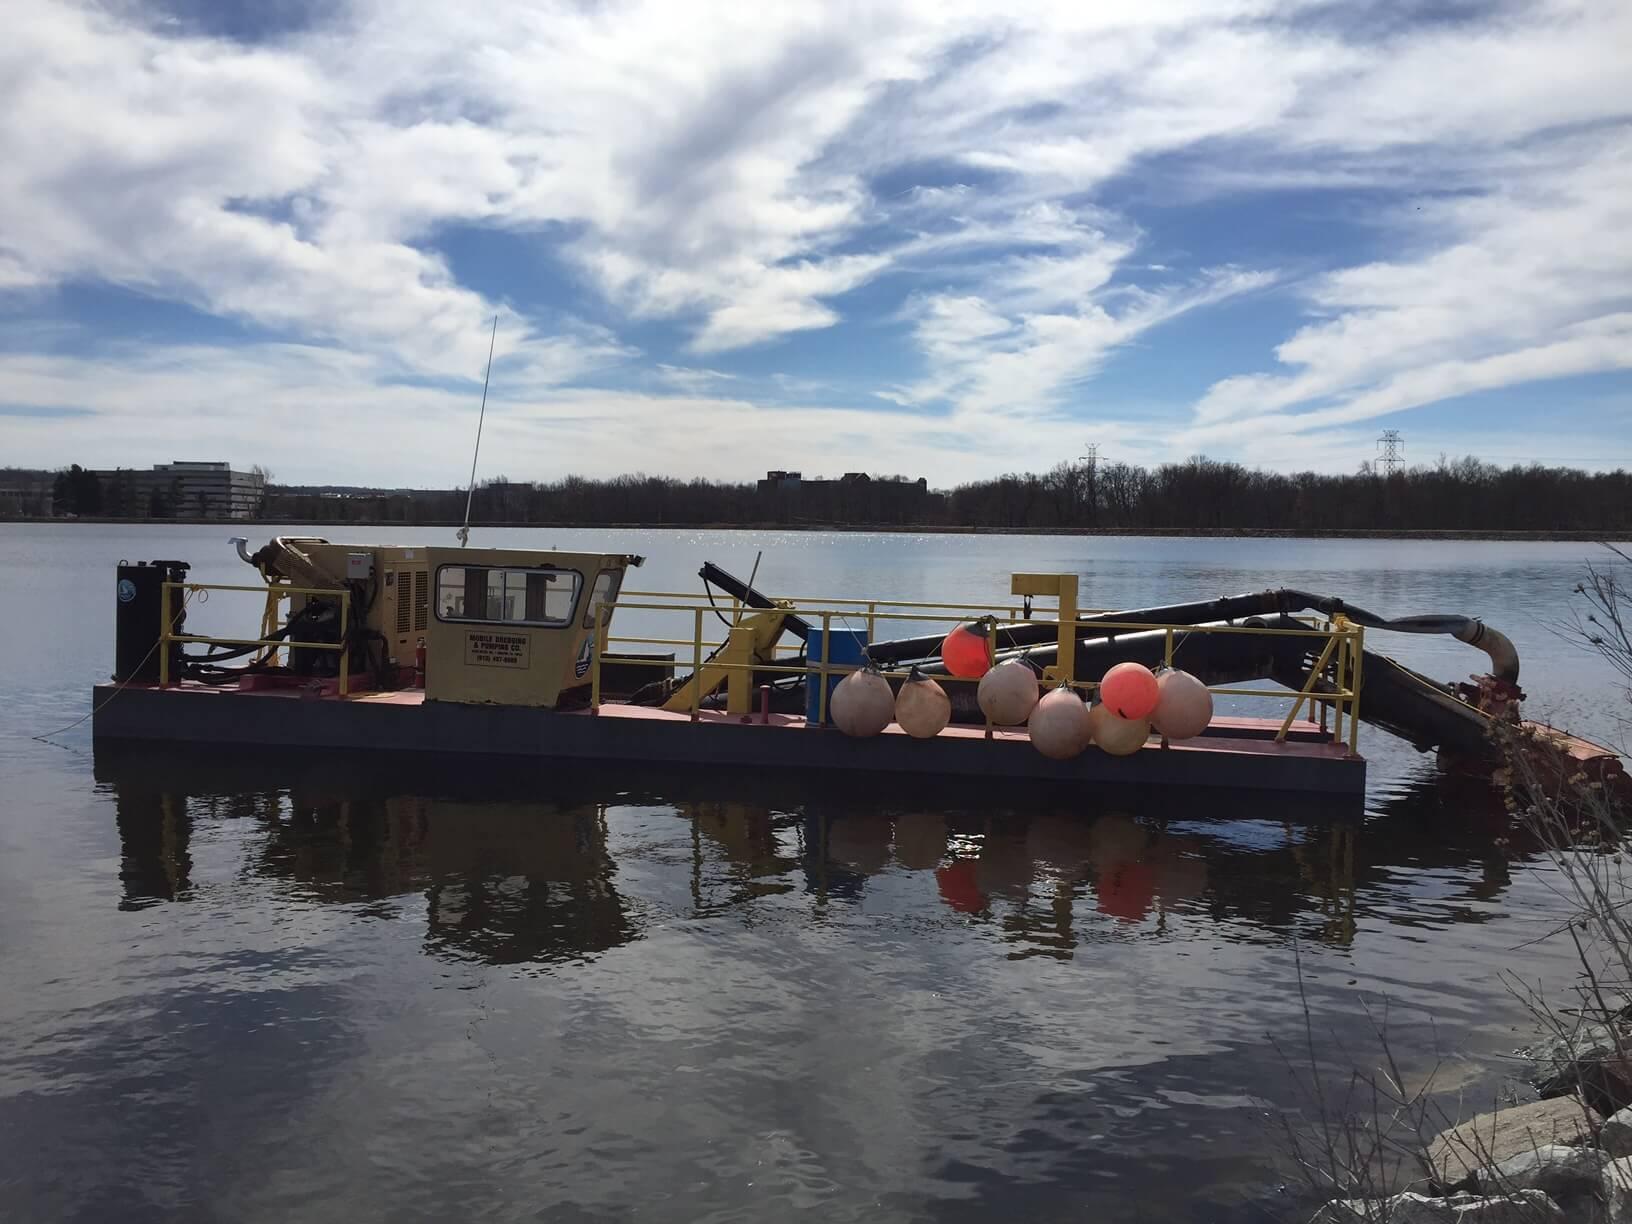 Lower Crum Creek Reservoir Dredging - Mobile Dredging Video Pipe